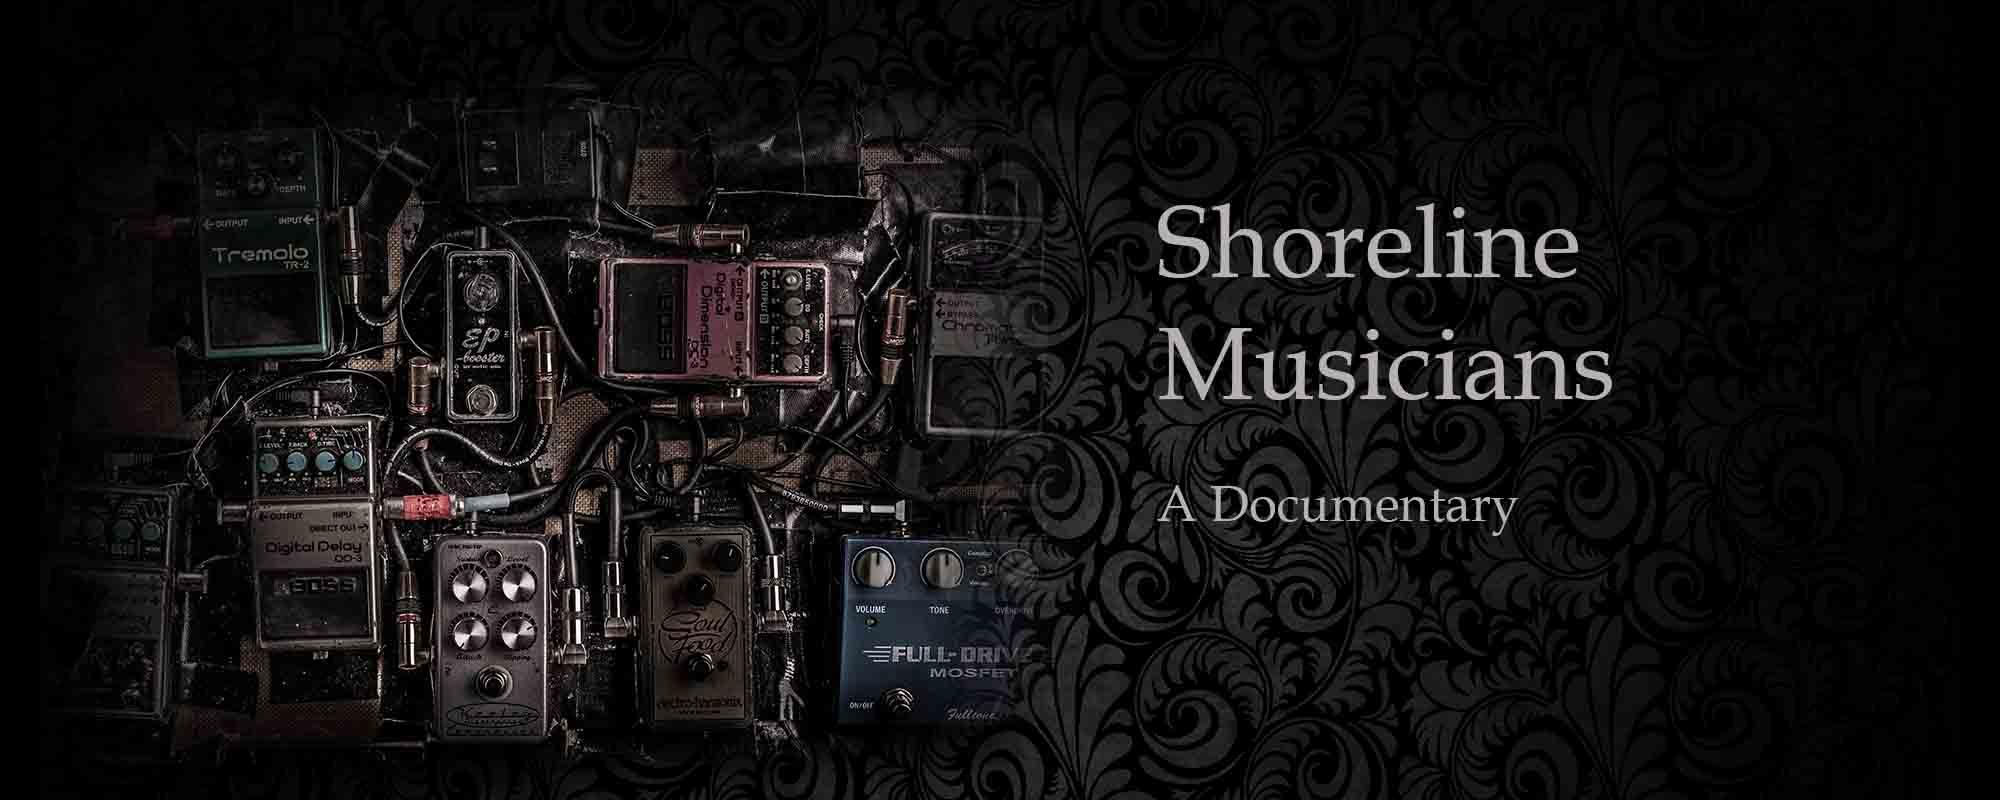 Shoreline Musicians